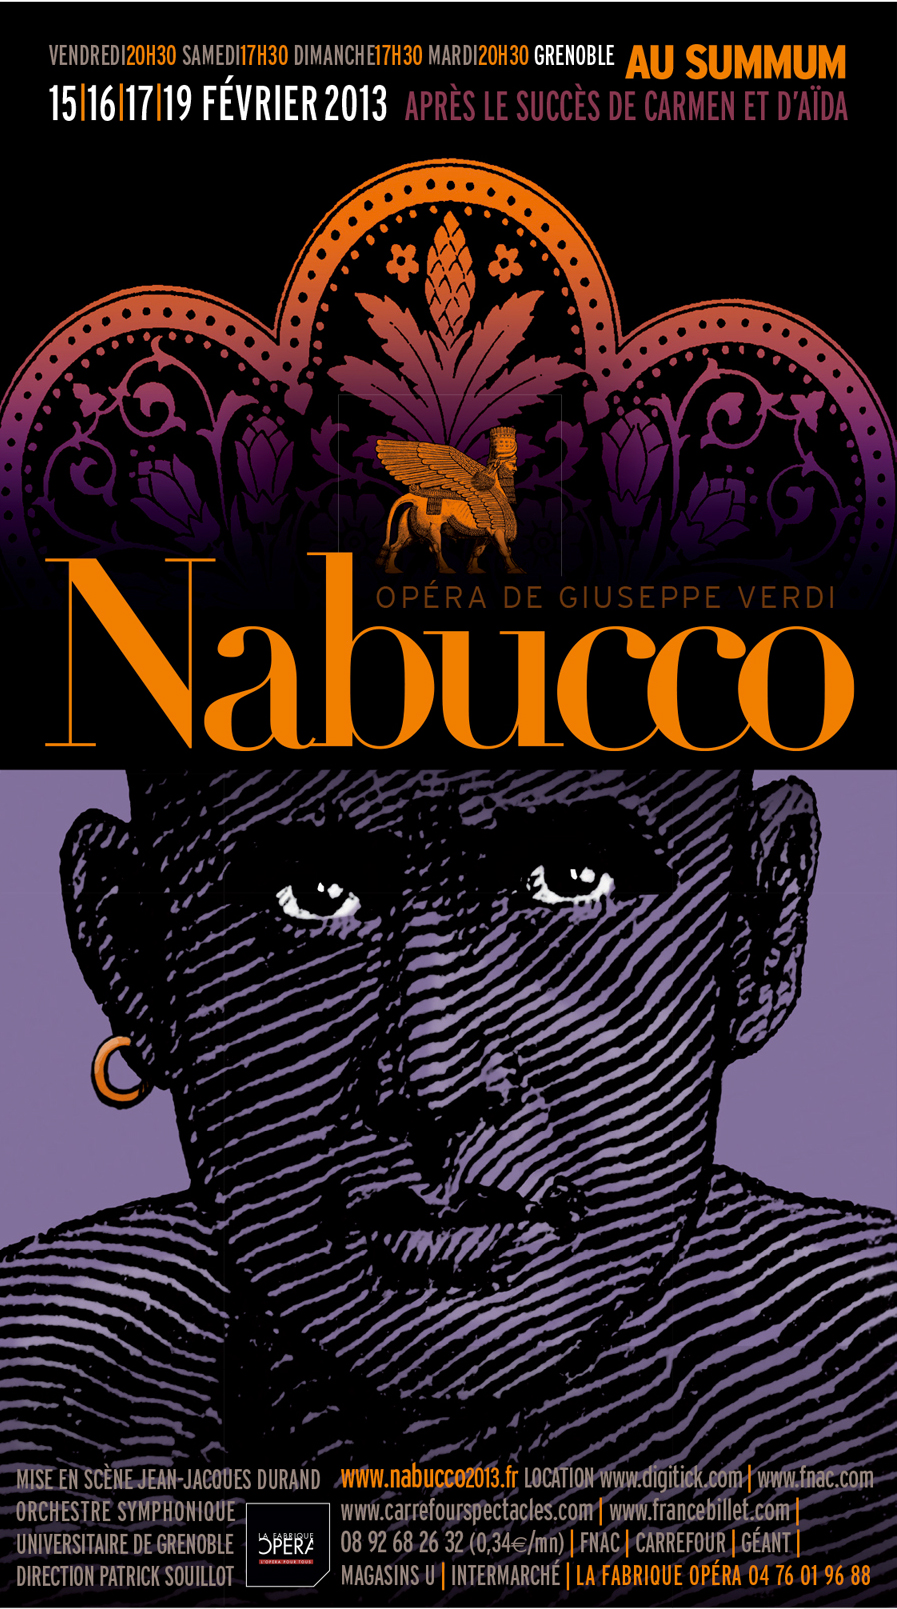 ZARAffiche-NabuccoH170xL95